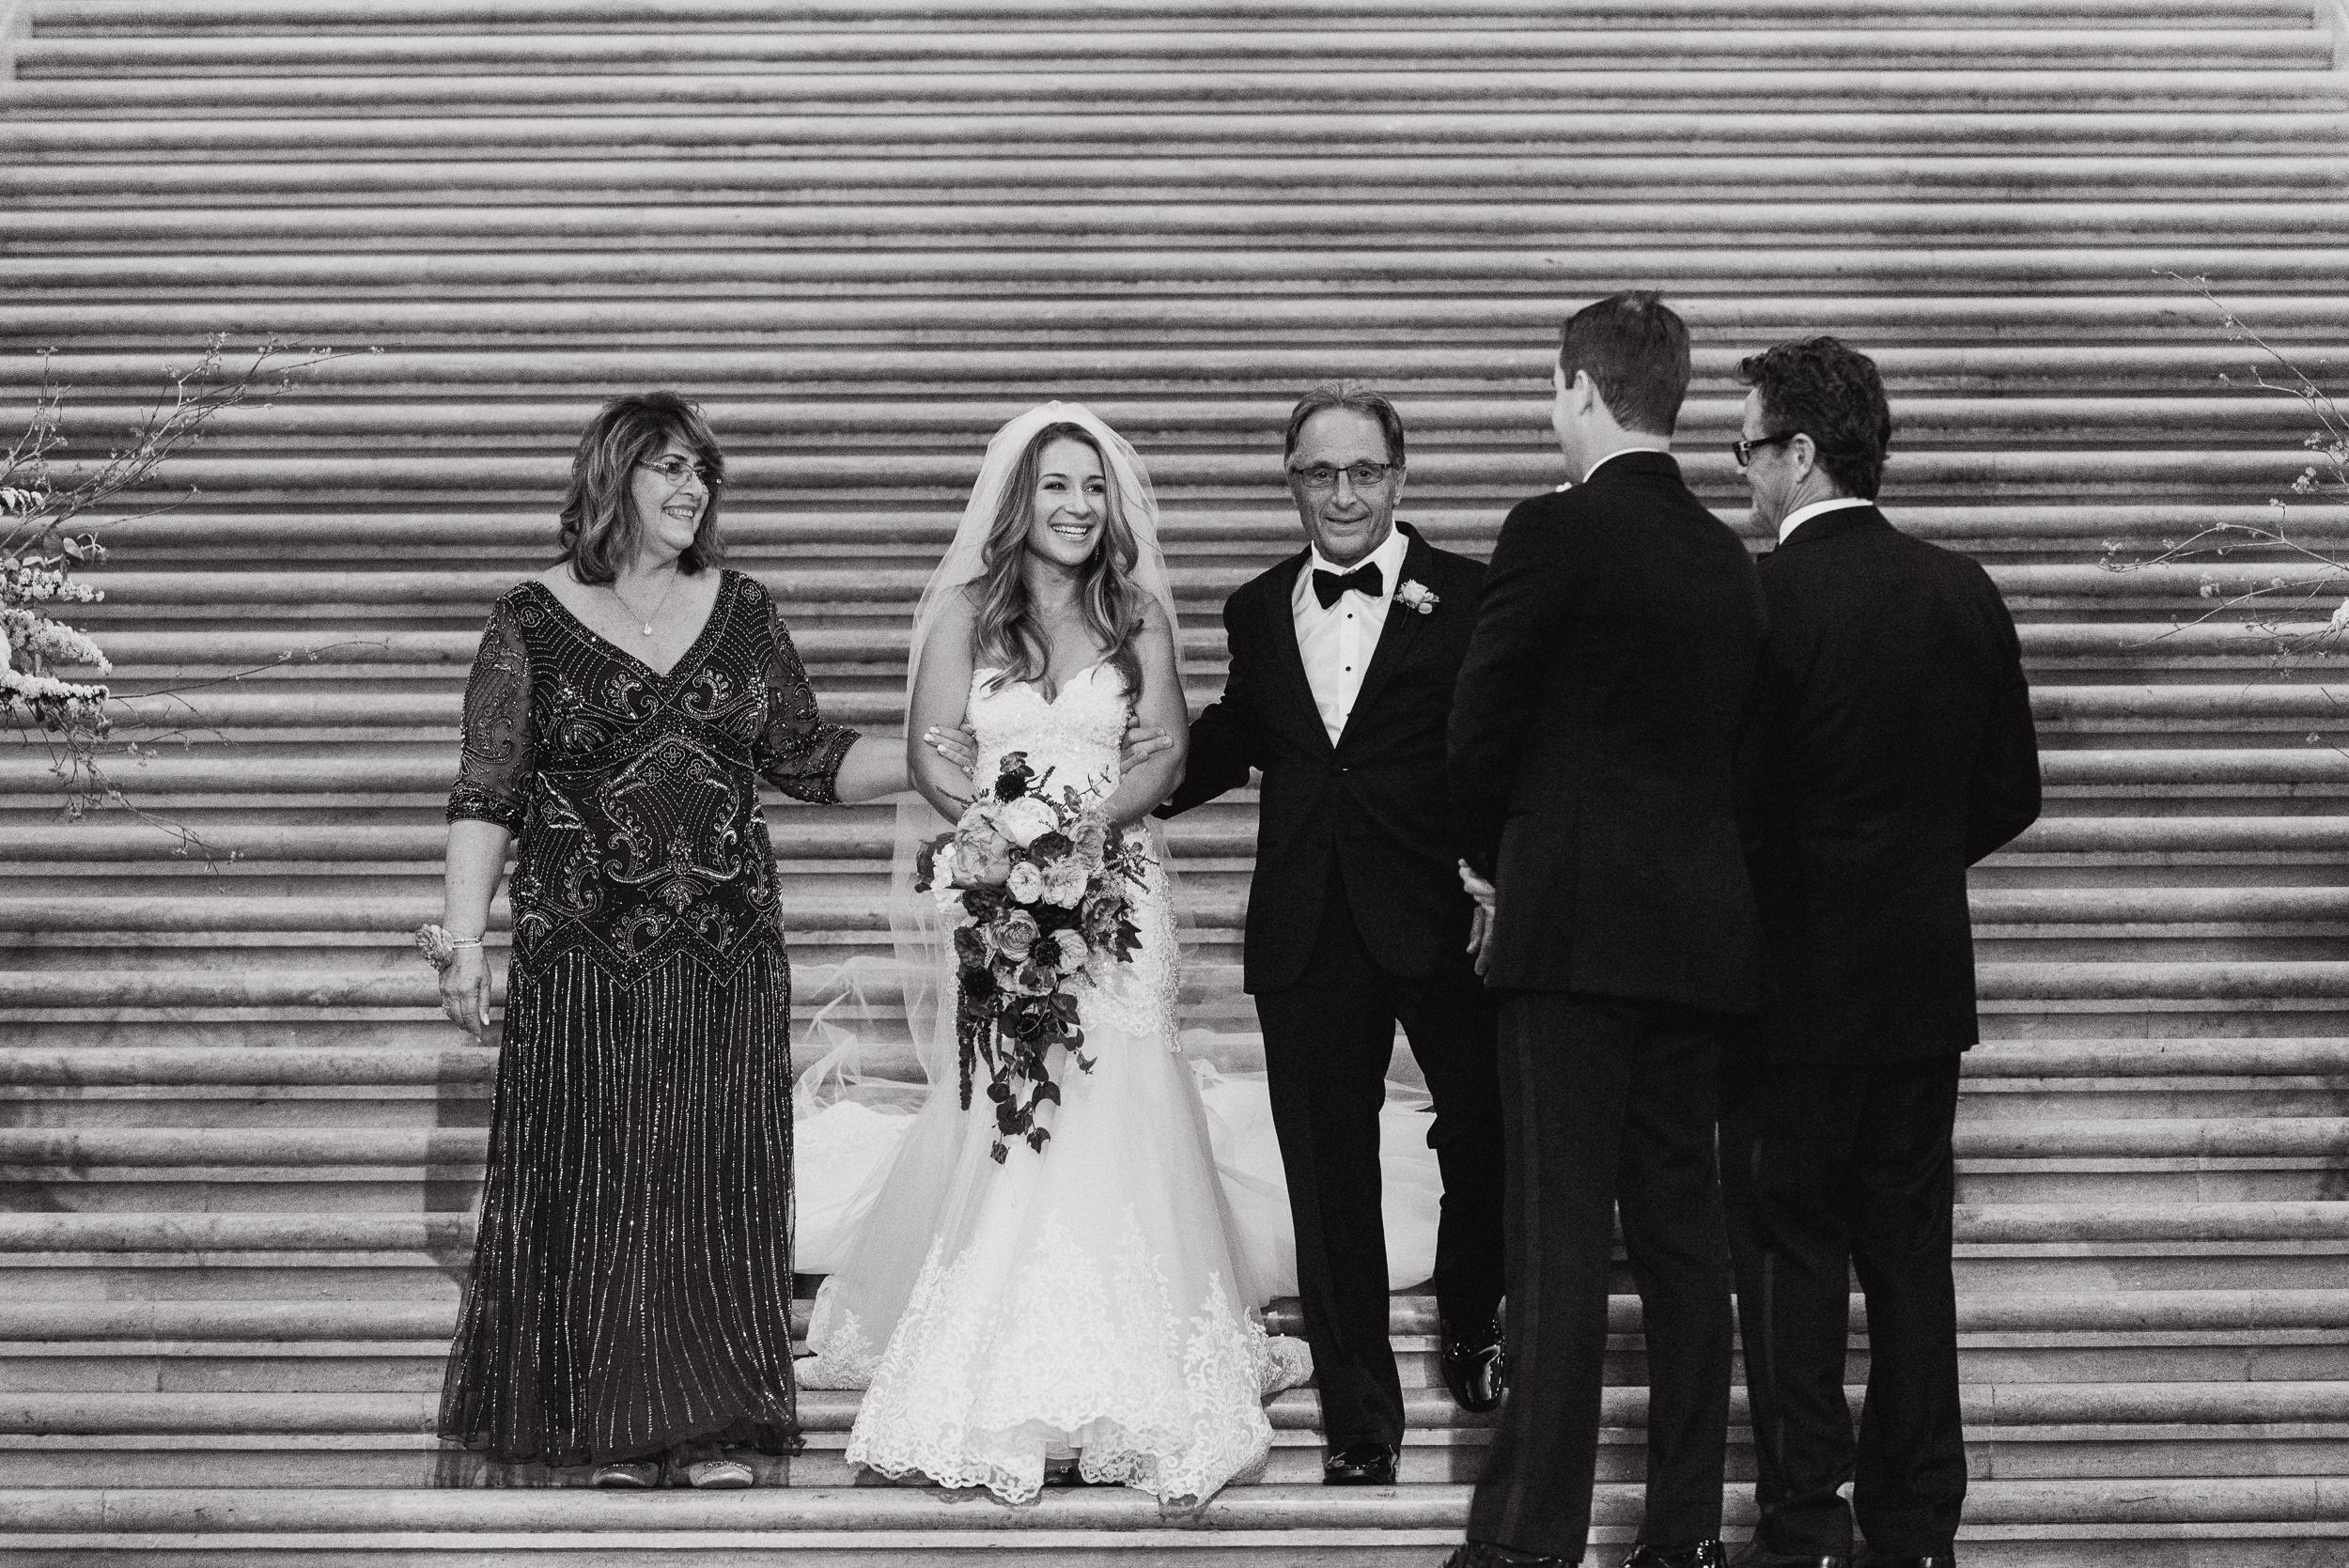 37-elegant-san-francisco-city-hall-wedding-vivianchen-0400.jpg